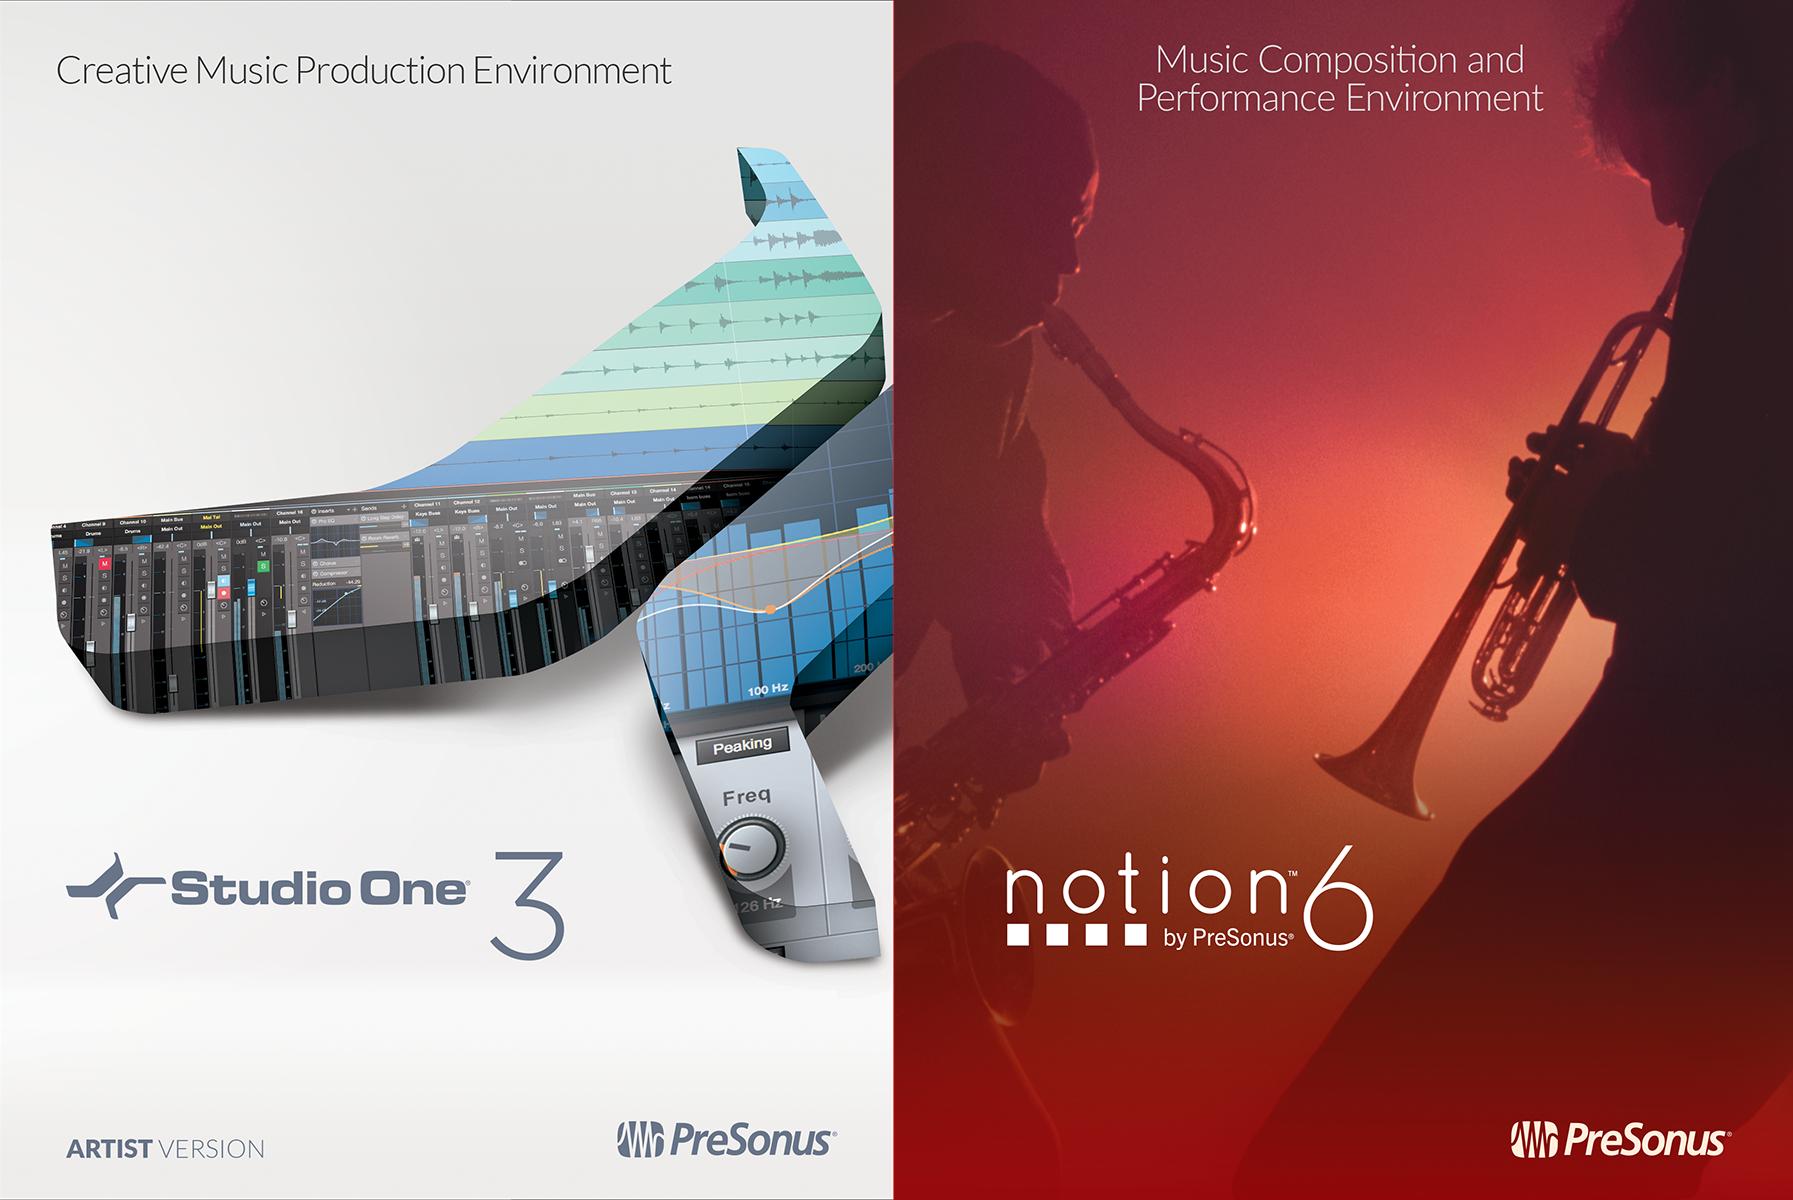 PreSonus Artist Bundle (Studio One 3 Artist and Notion 6) [Online Code] (Digital Performer 7 Software)